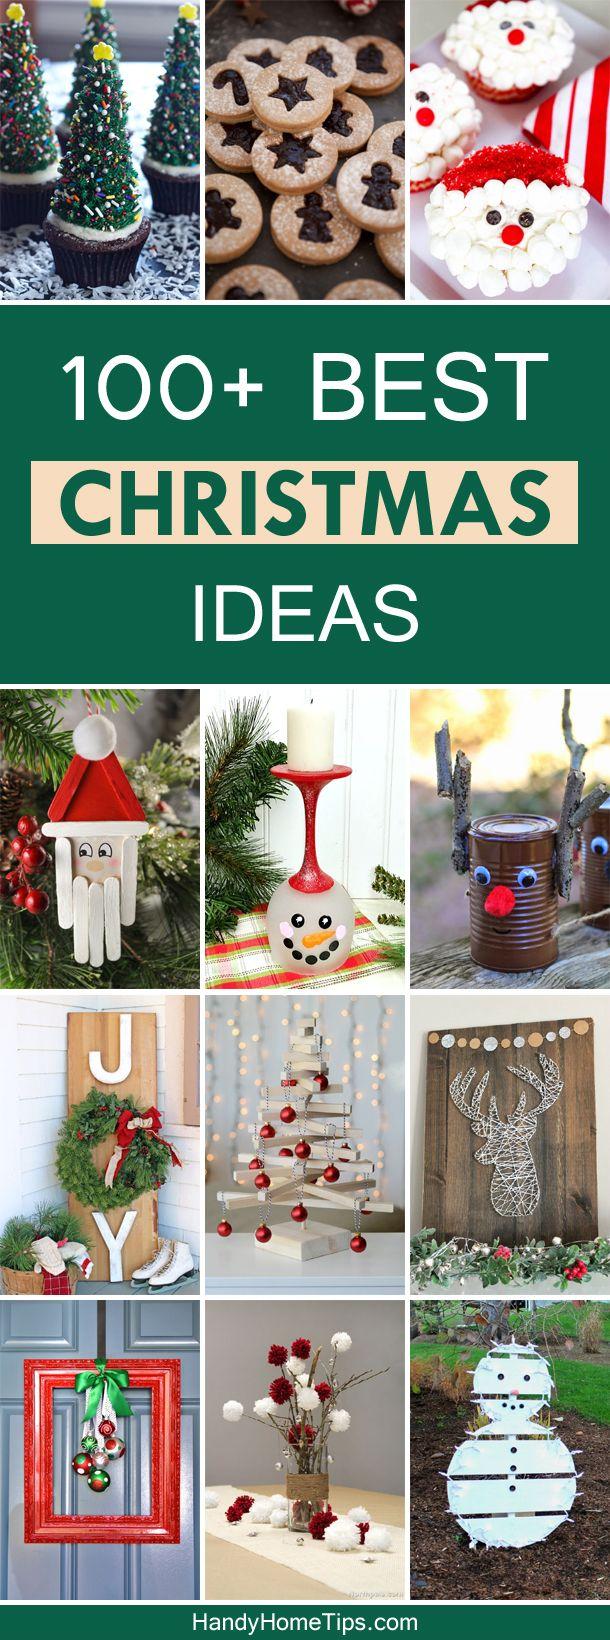 100+ Best Christmas Ideas - Gifts, Recipes & Decor | Christmas ...